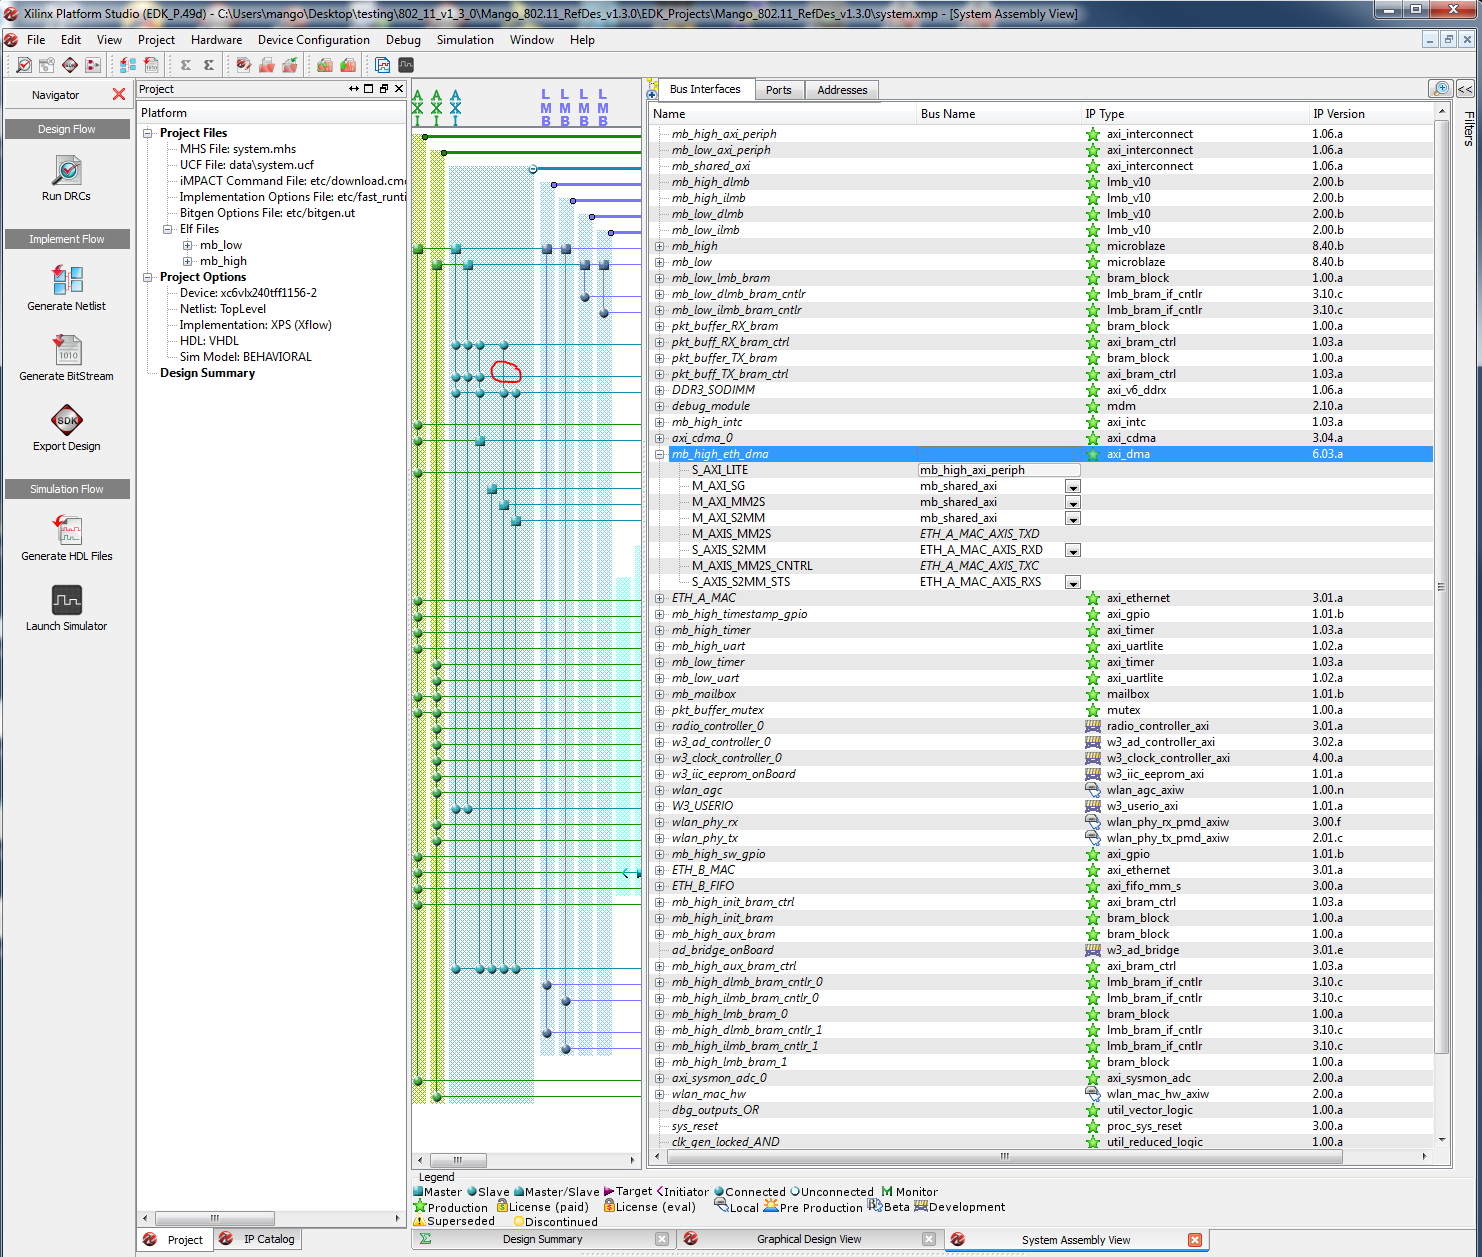 http://warp-downloads.s3.amazonaws.com/images/forum_images/802_11_v1_3_0_connectivity_mod.PNG